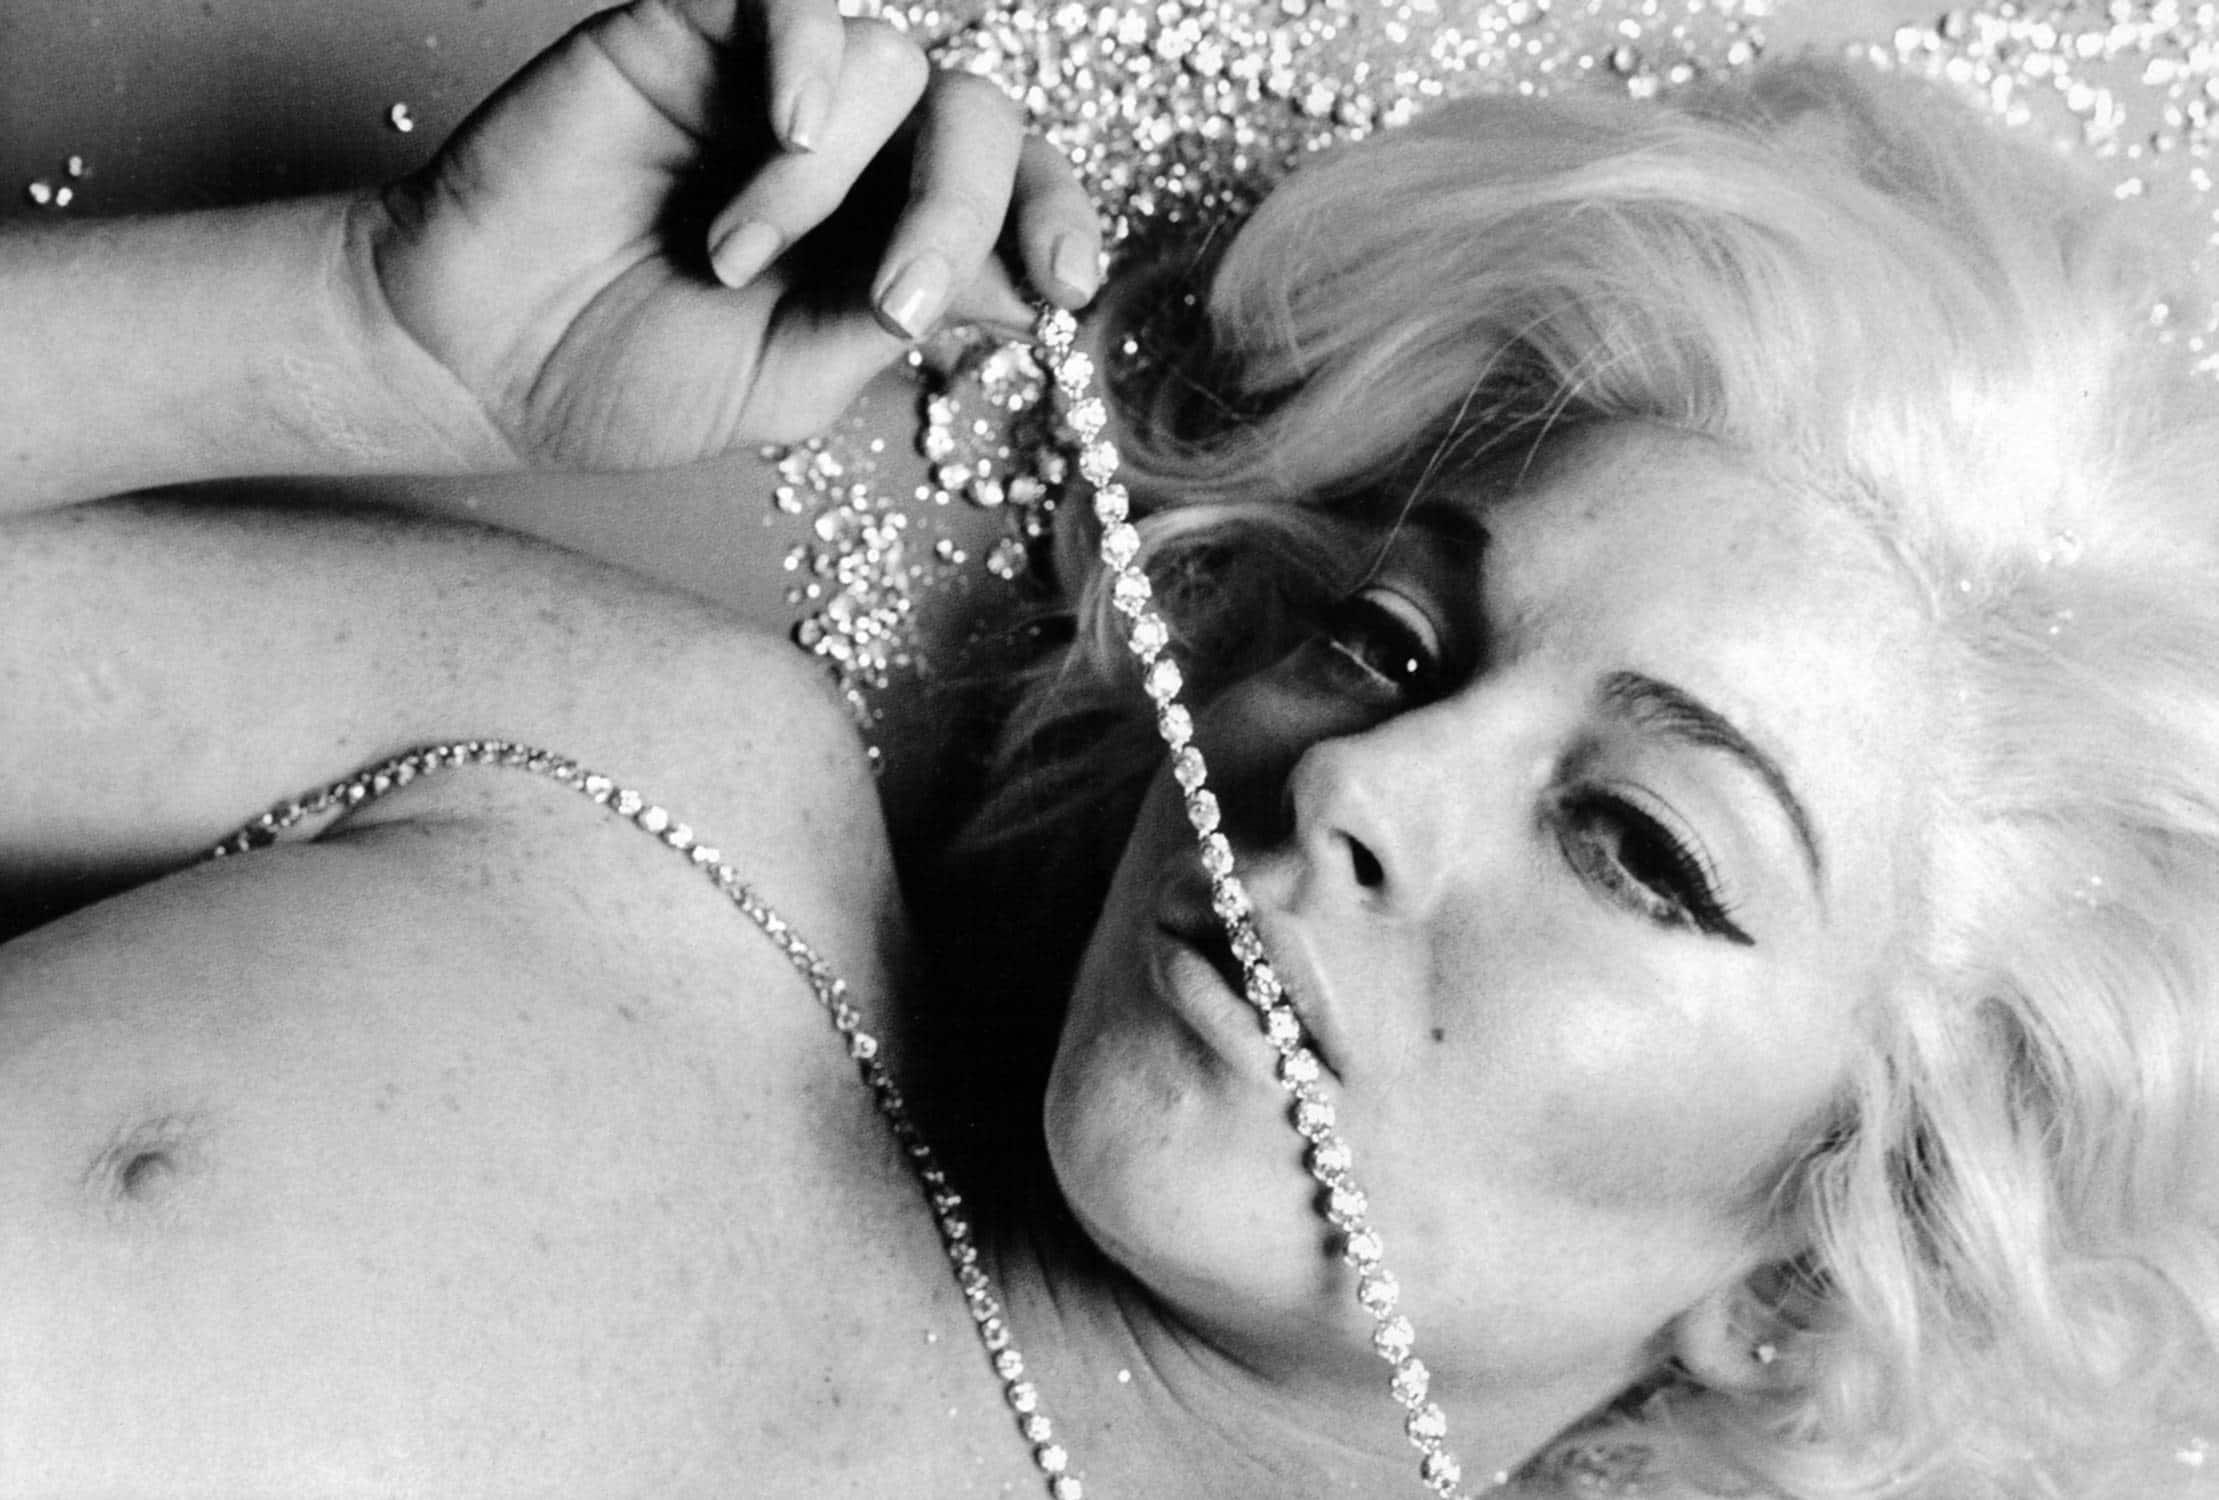 Lindsay lohan recreates marilyn monroe's final nude photo